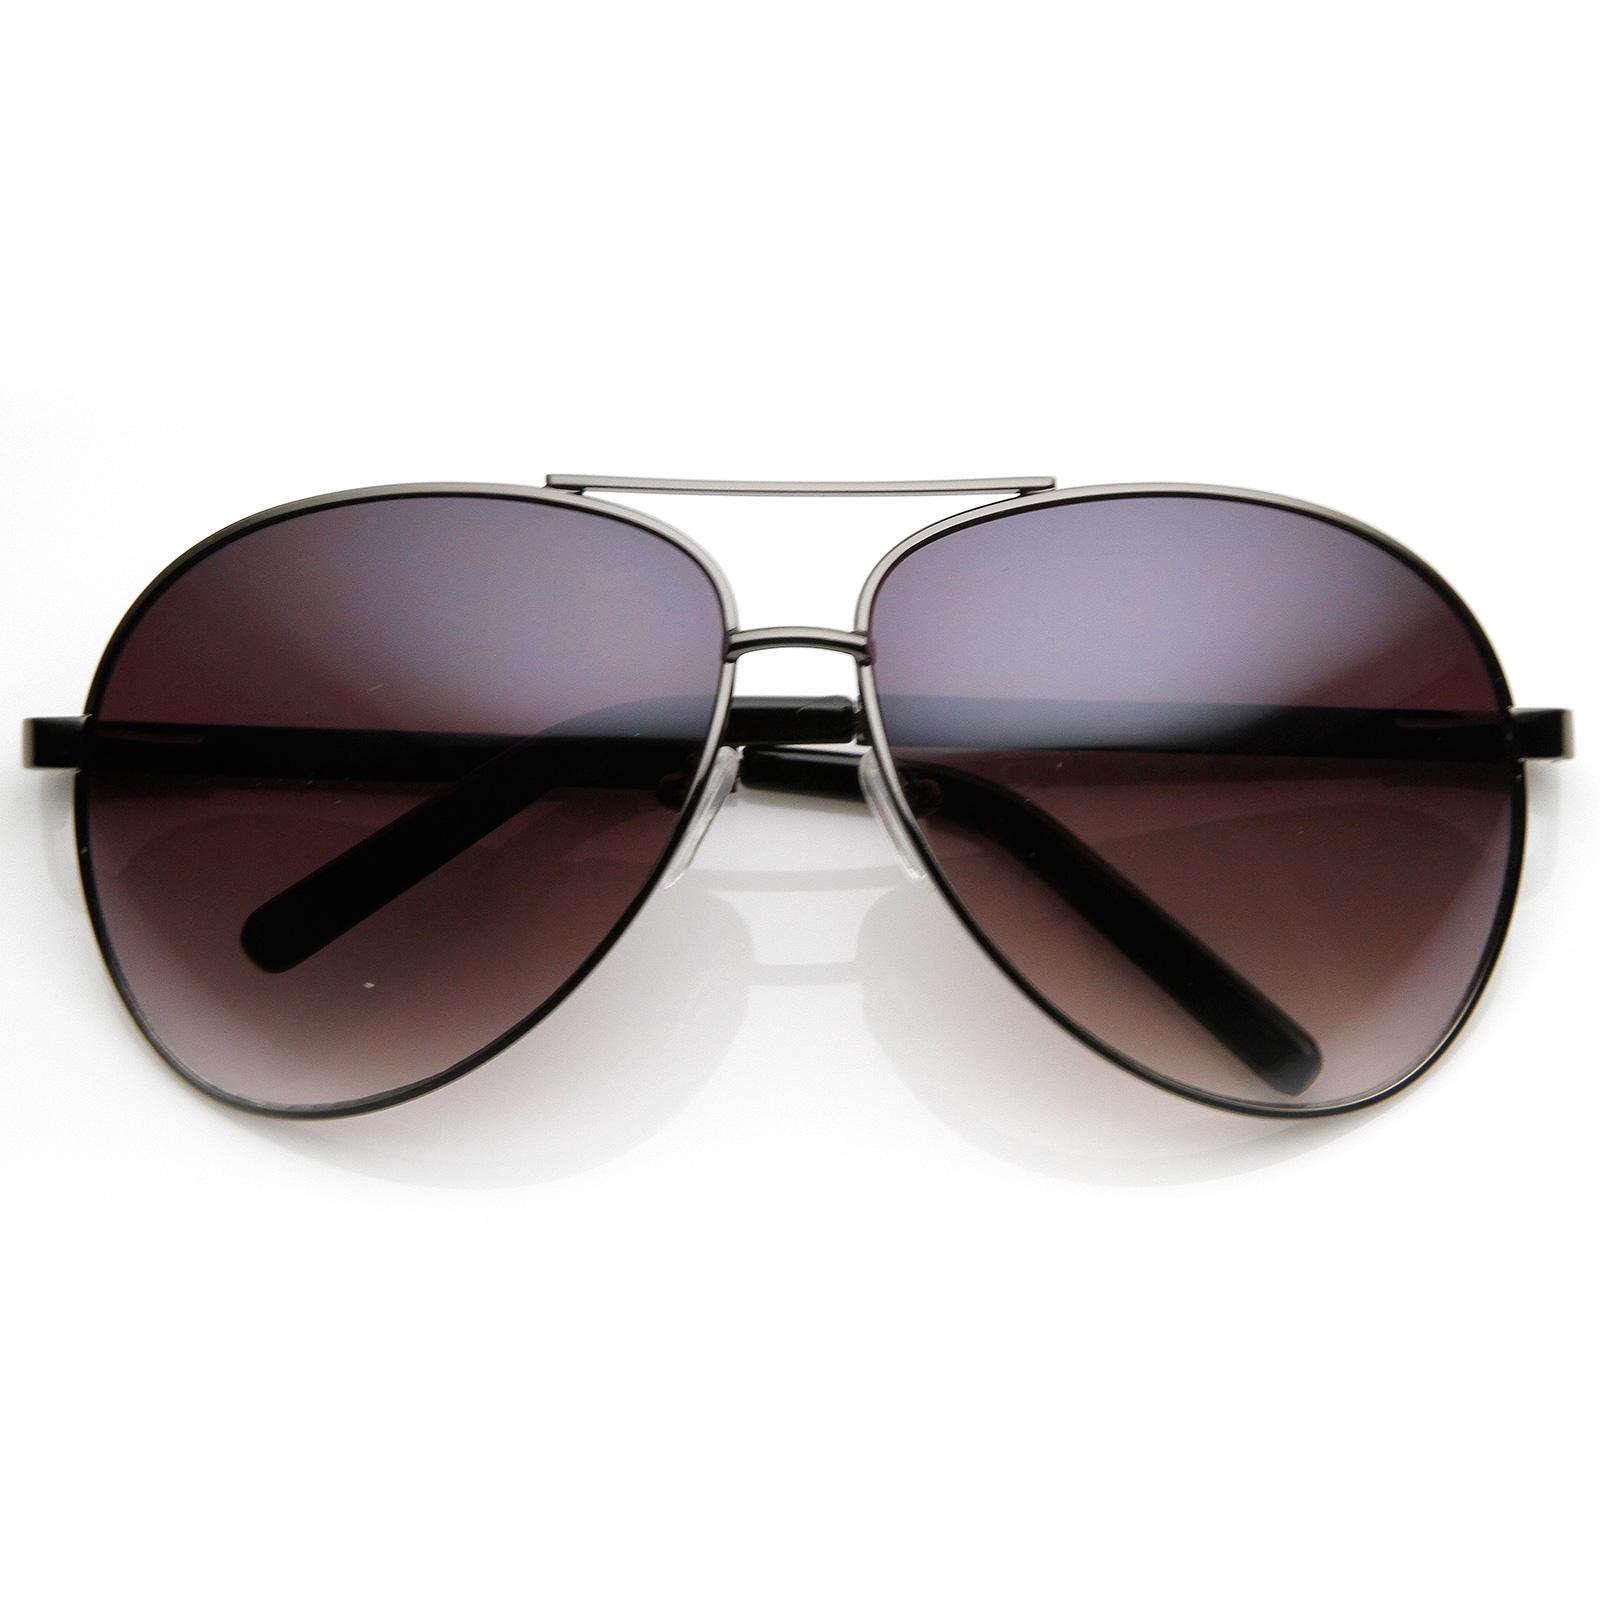 Hollywood-Fashion-Designer-Inspired-2-Tone-Large-Metal-Aviator-Sunglasses-1508